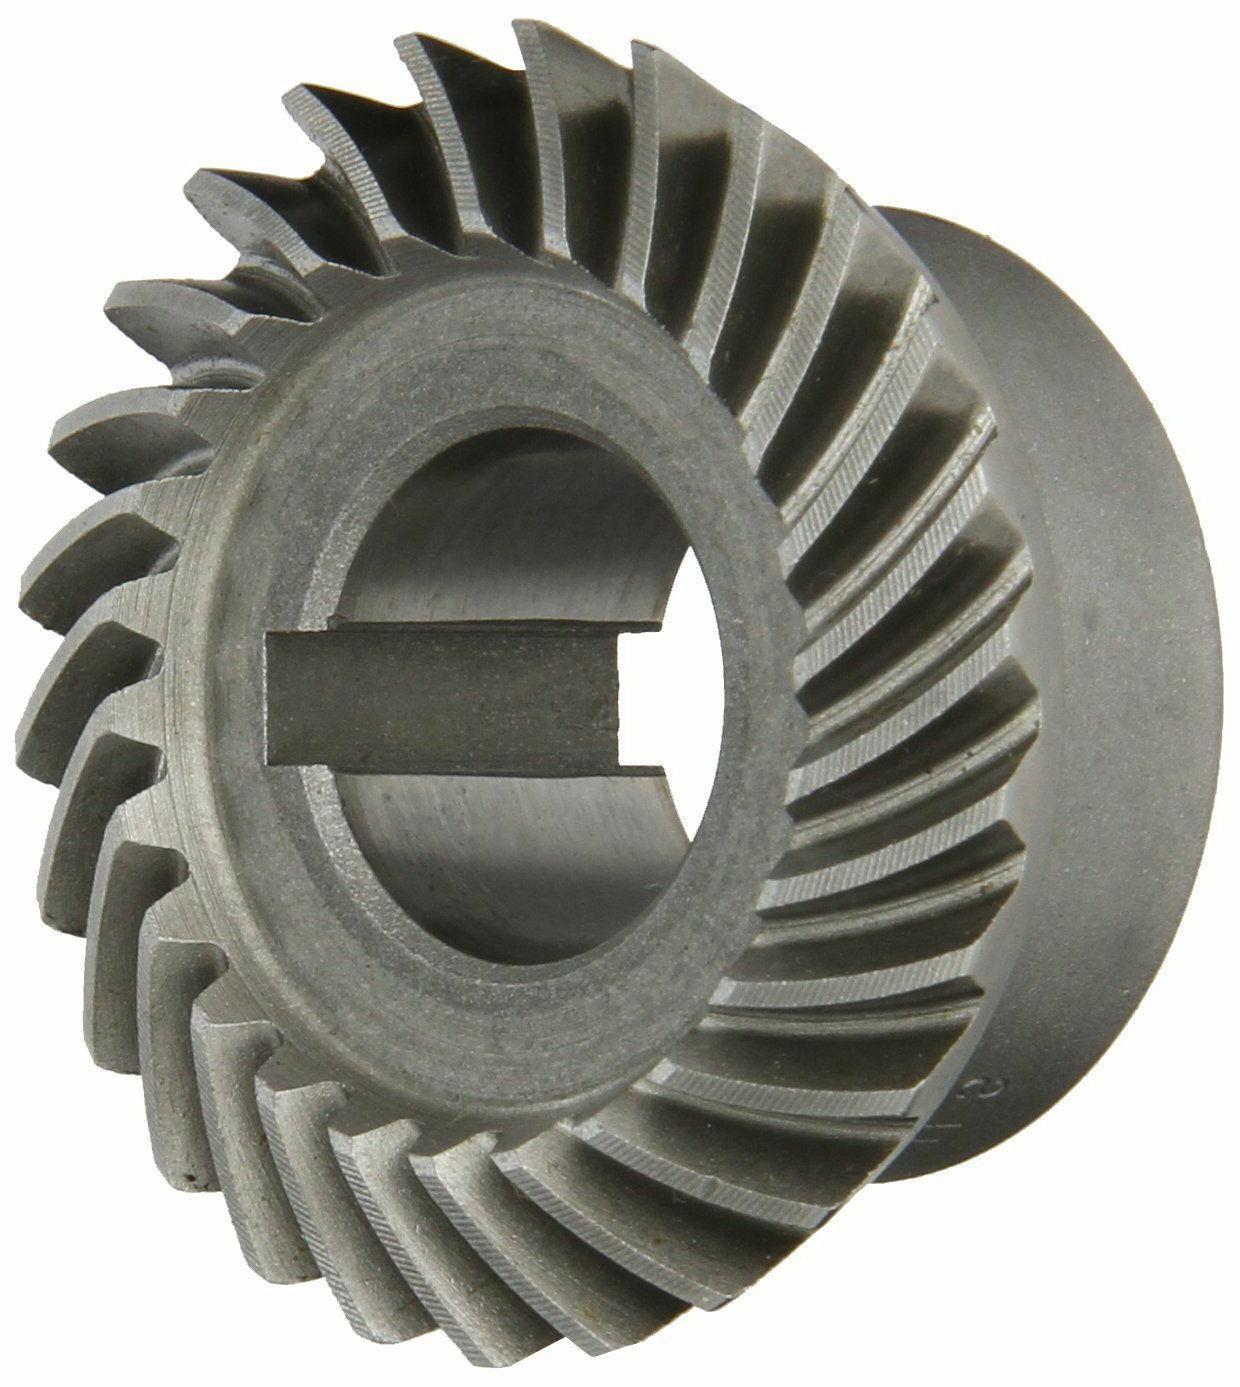 "Boston Gear SH142-G Spiral Bevel Gear, 2:1 Ratio, 0.750"" Bor"